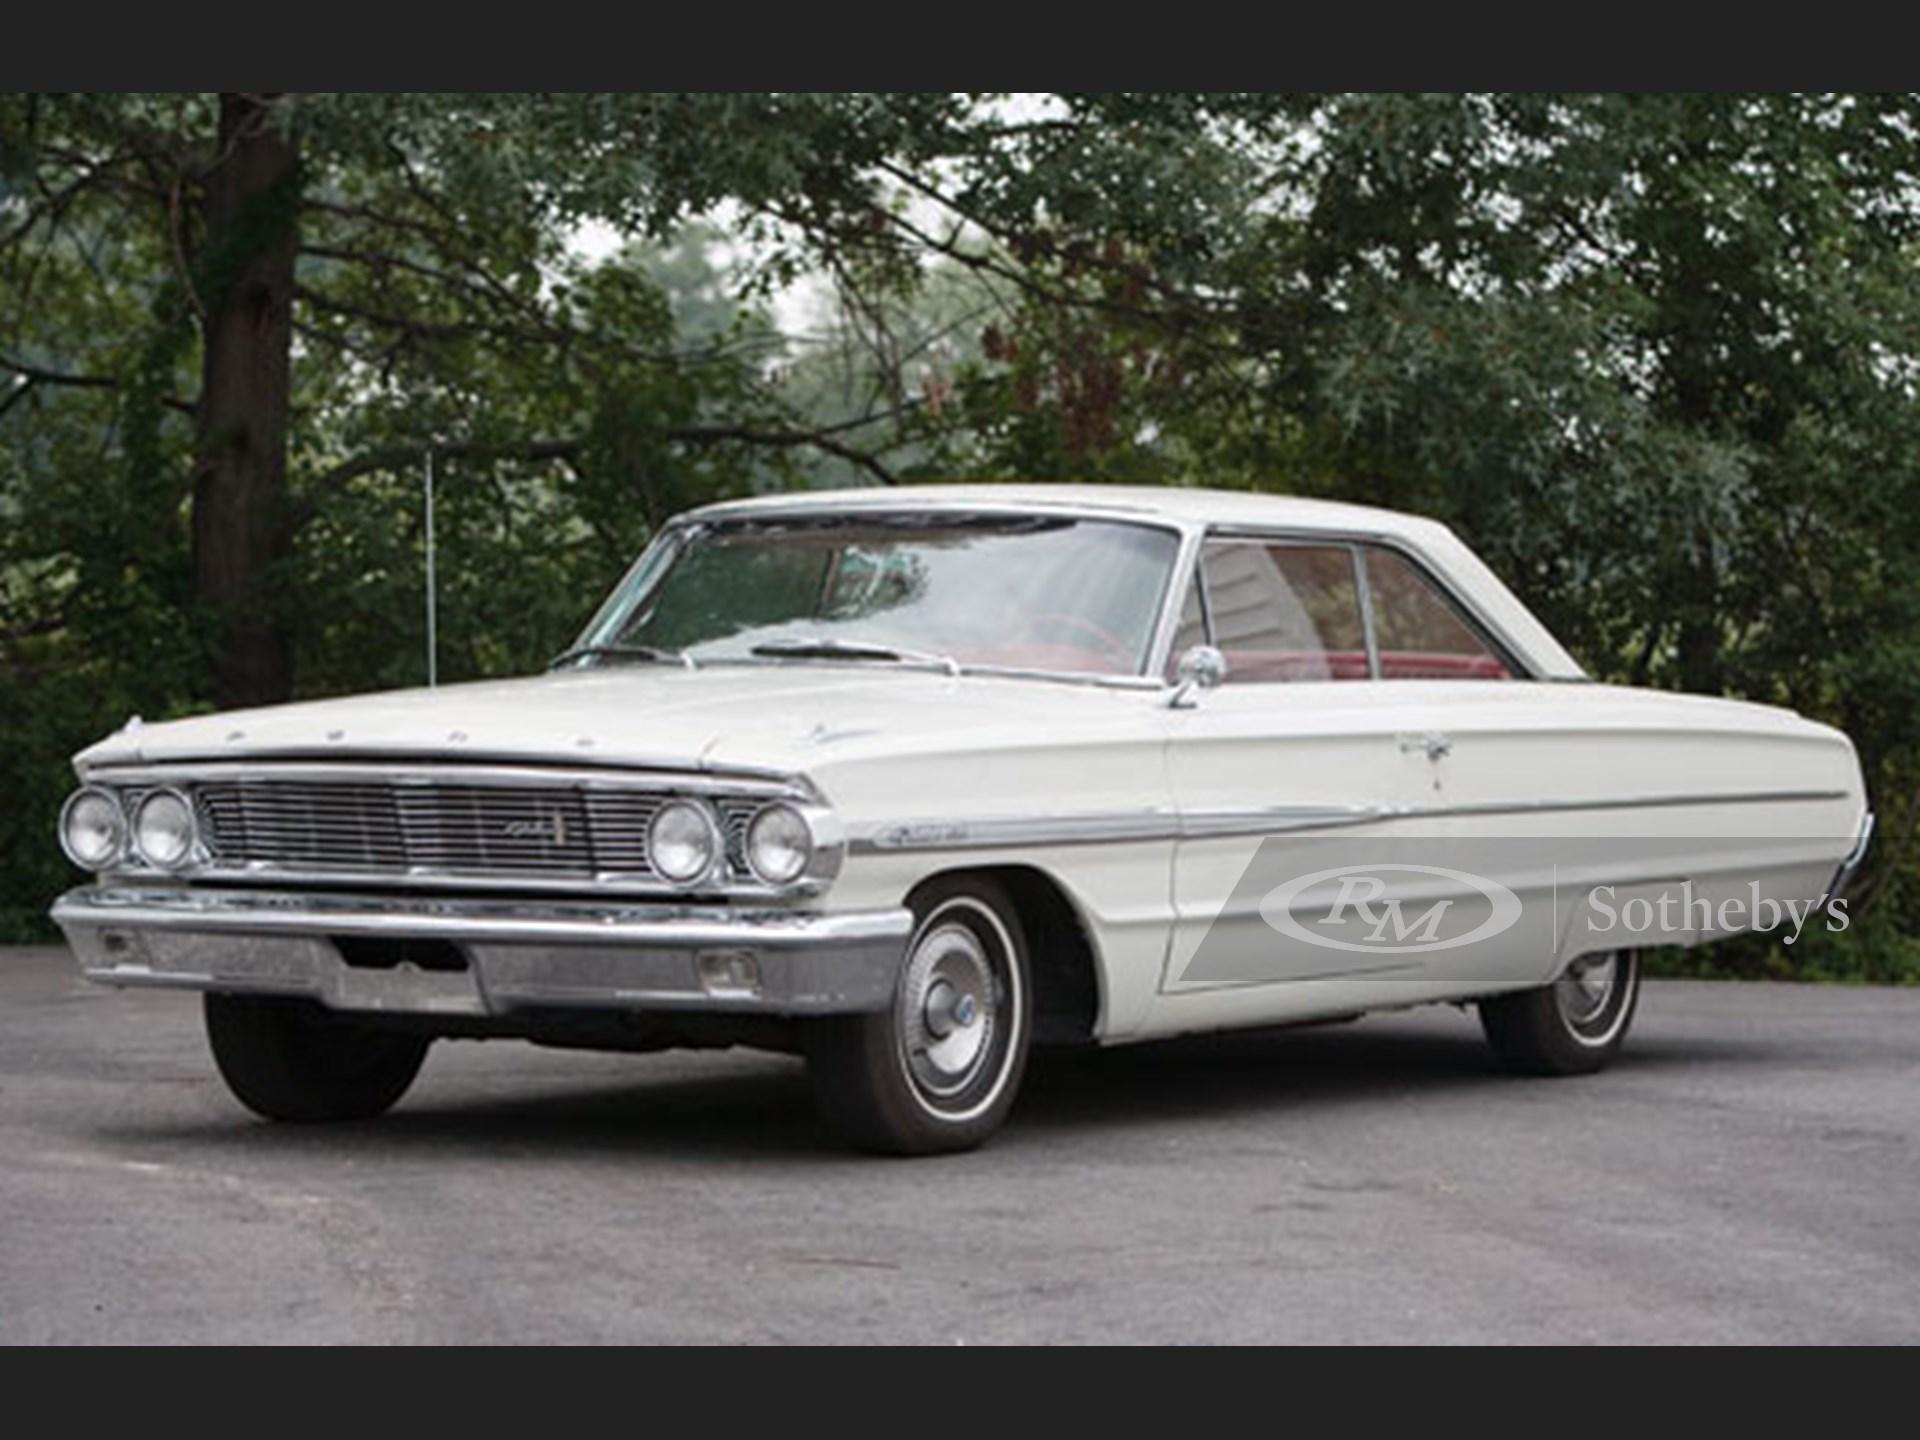 1964 Ford Galaxie 500 Fastback